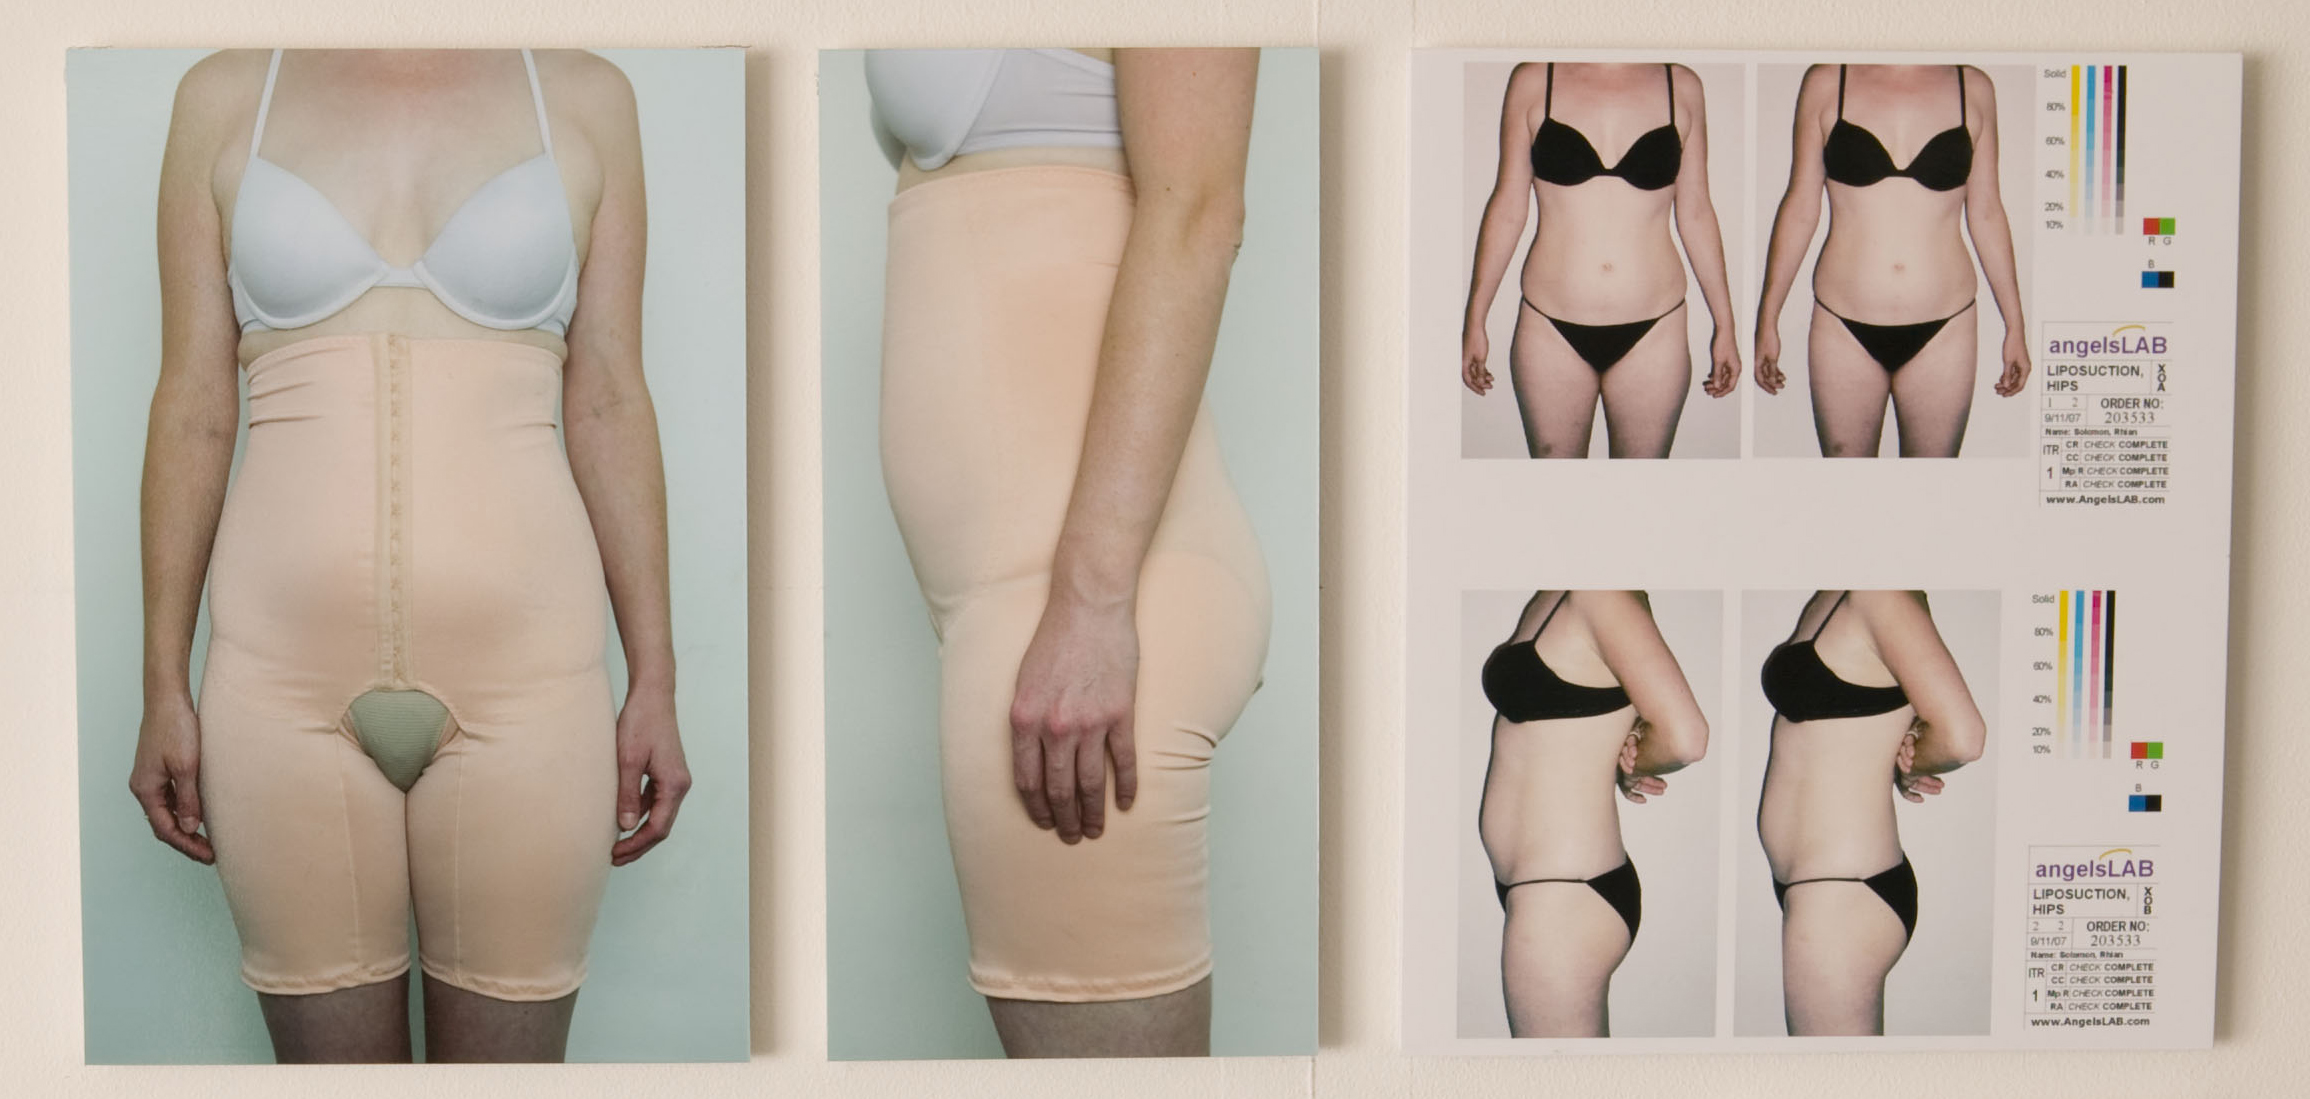 Virtual Liposuctionsmall.jpg